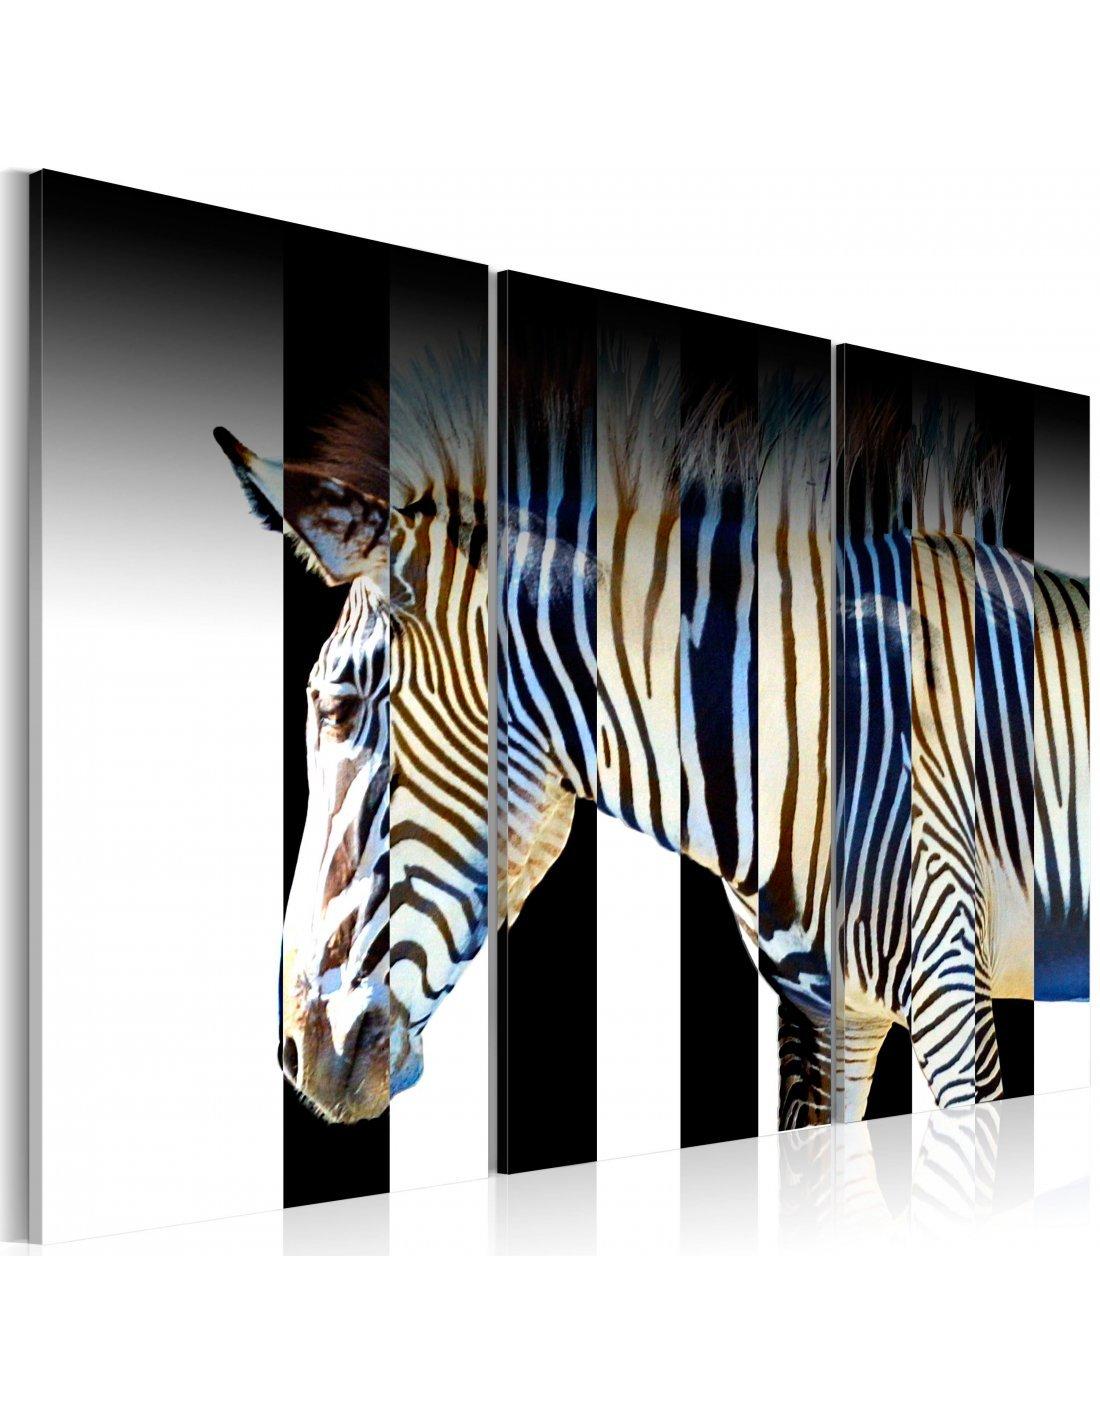 tableau triptyque rayures 74 90 chez recollection. Black Bedroom Furniture Sets. Home Design Ideas